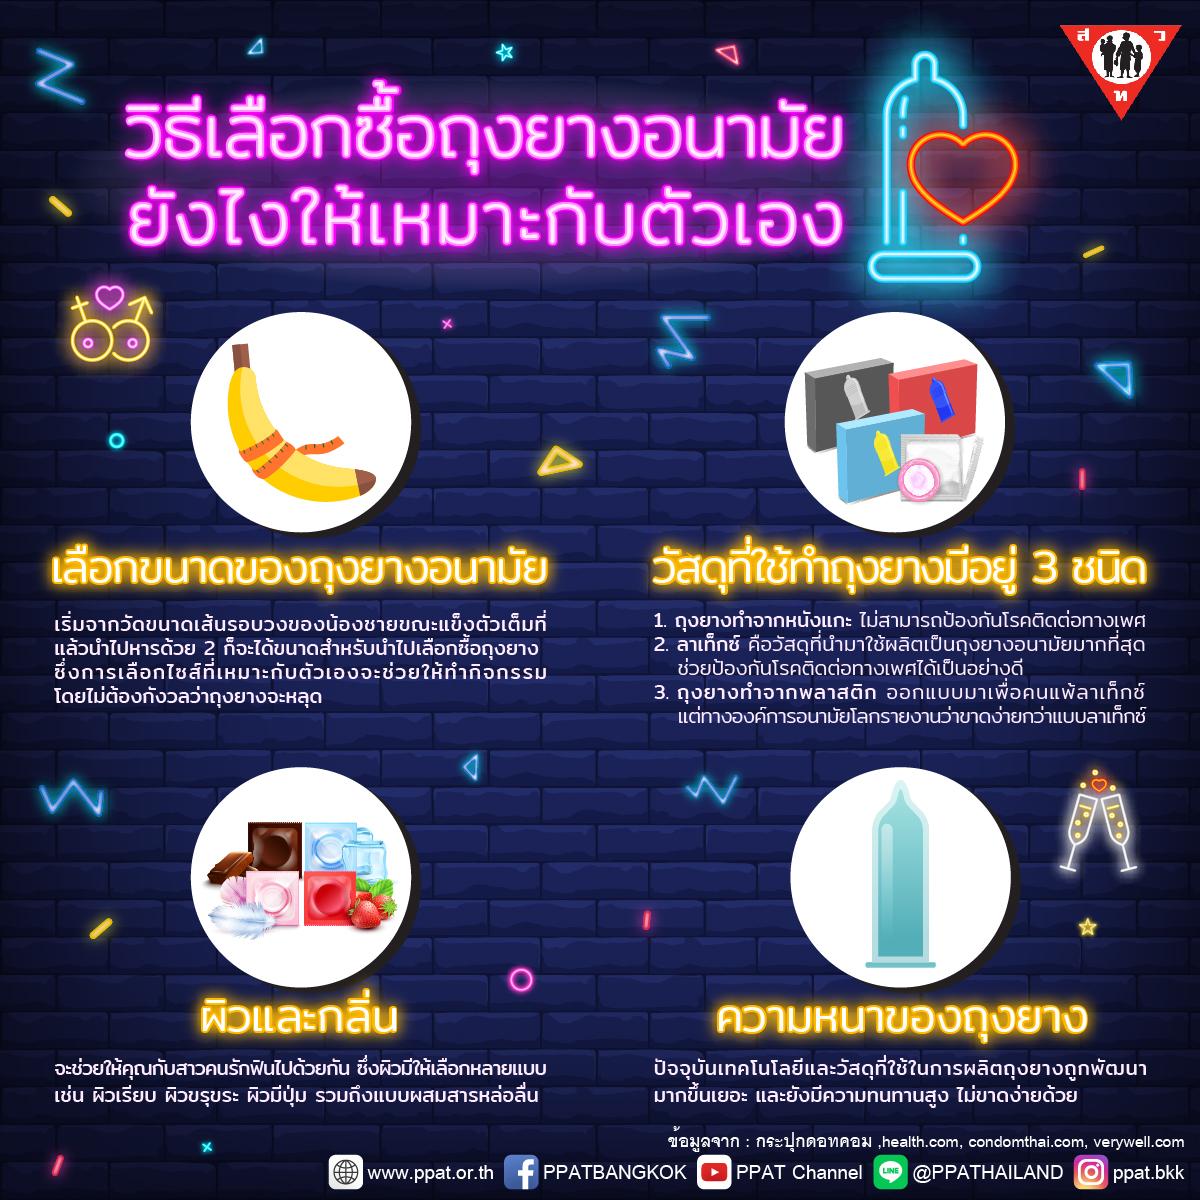 ad-condom-01